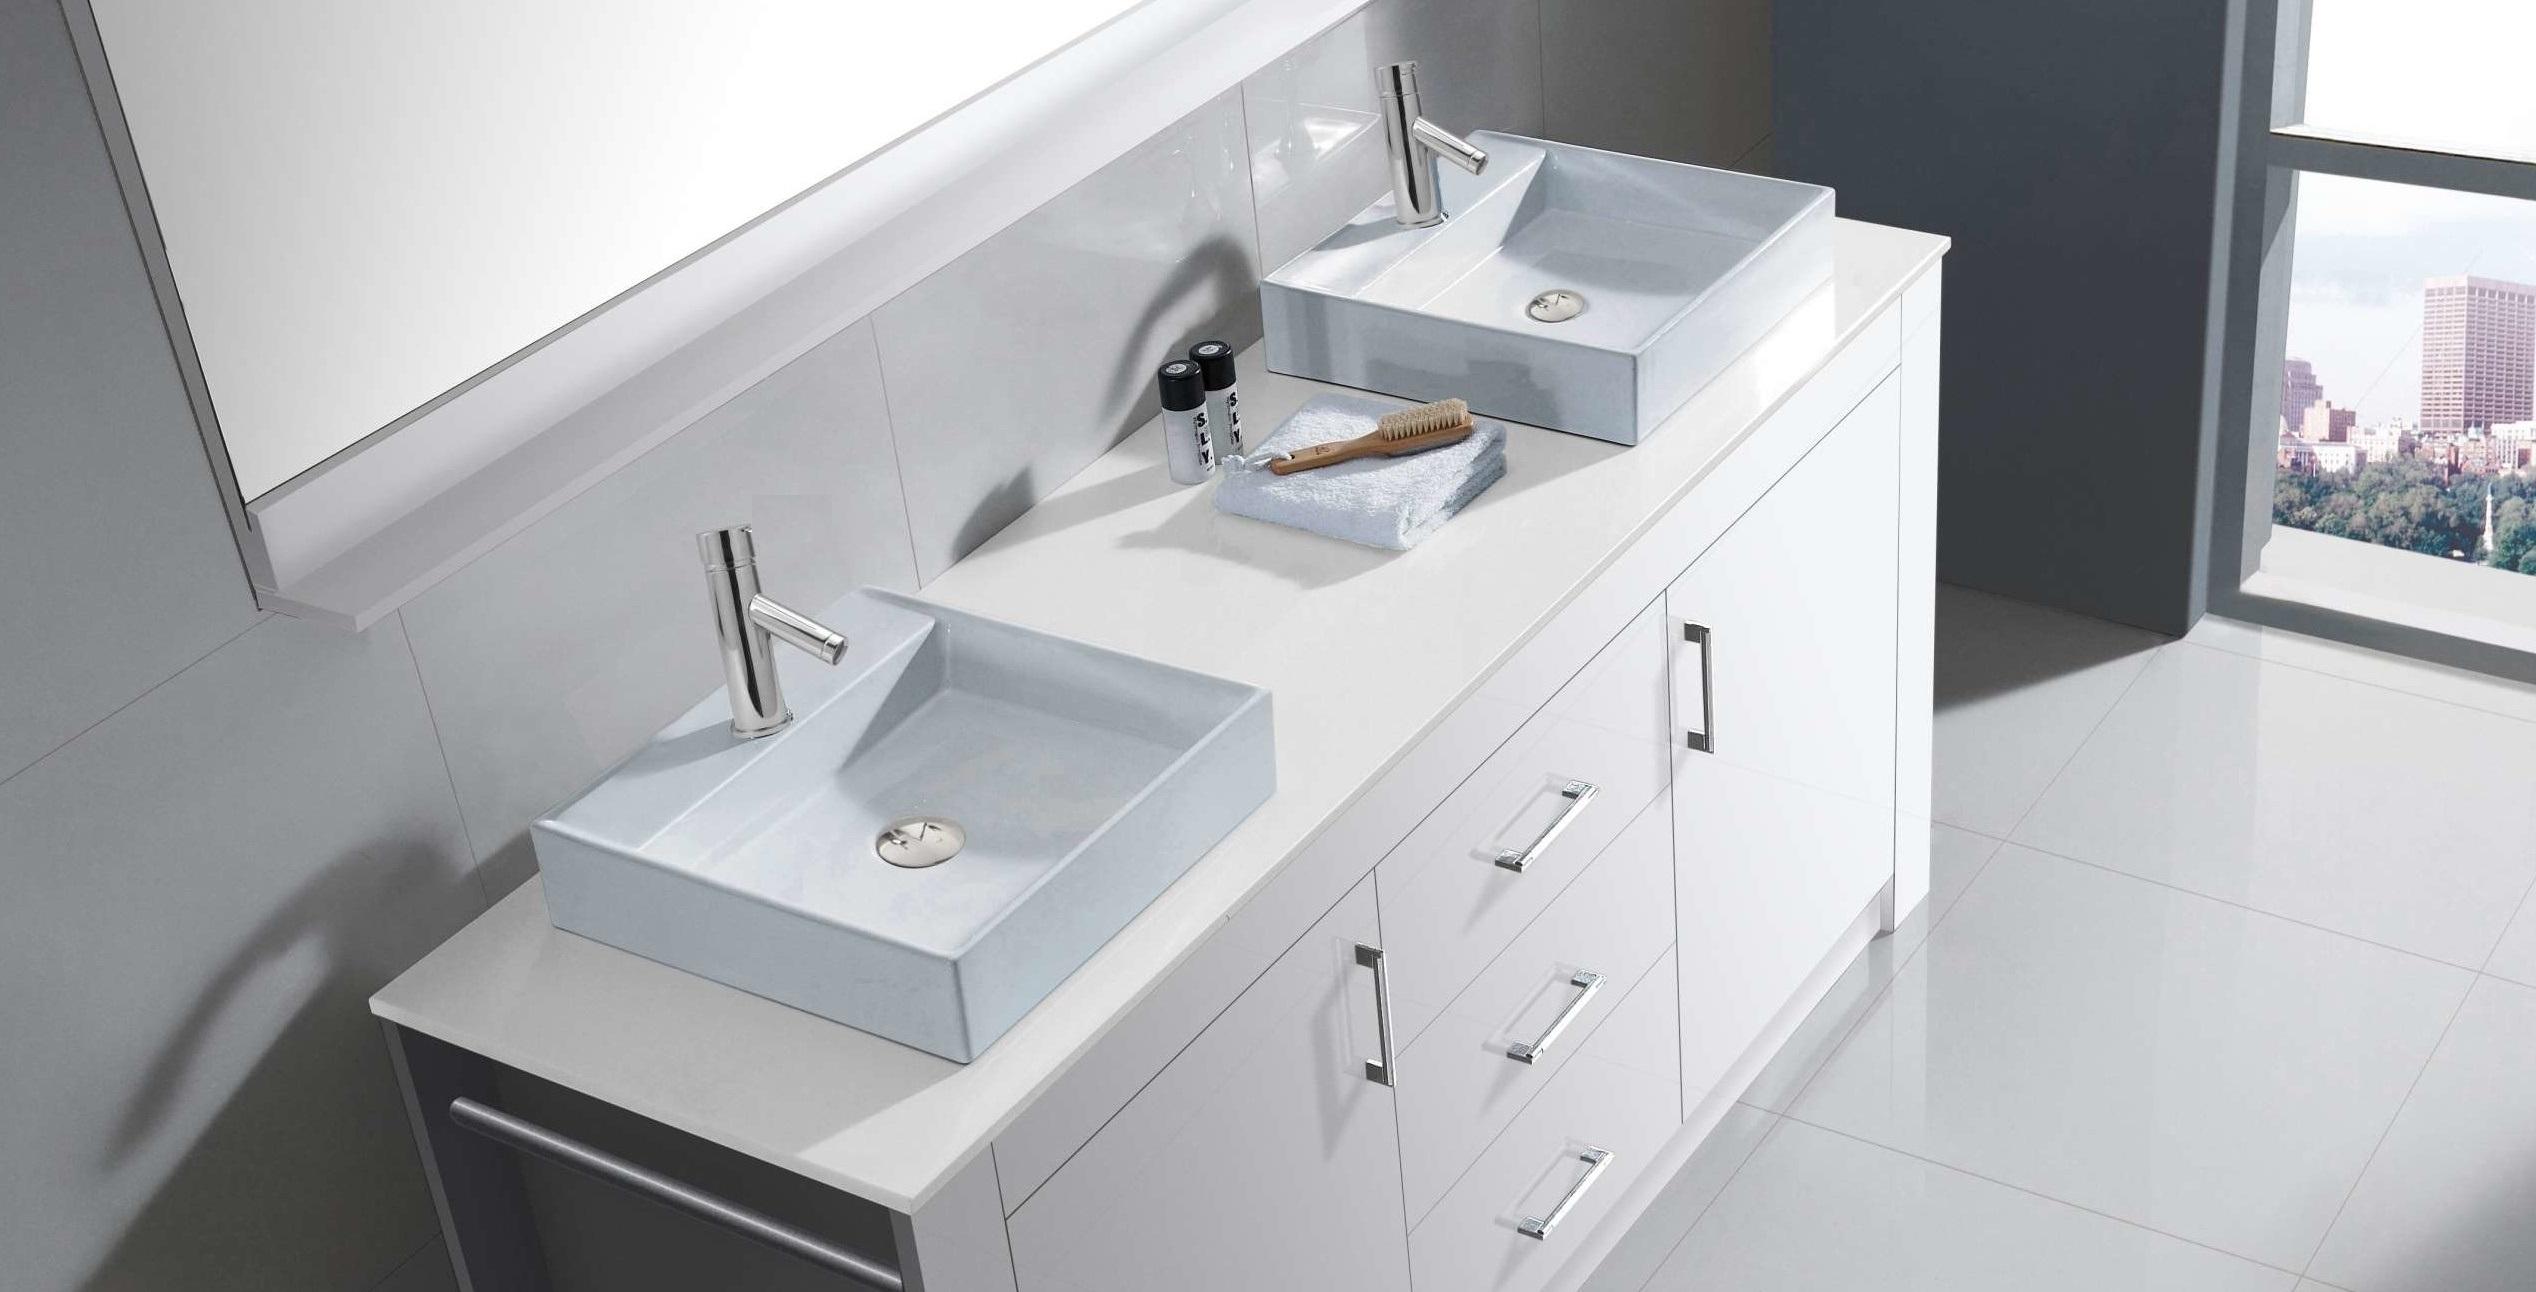 Motion Sensor Faucets The Contemporary Hygienic, Smart Sensor Automatic  Faucets